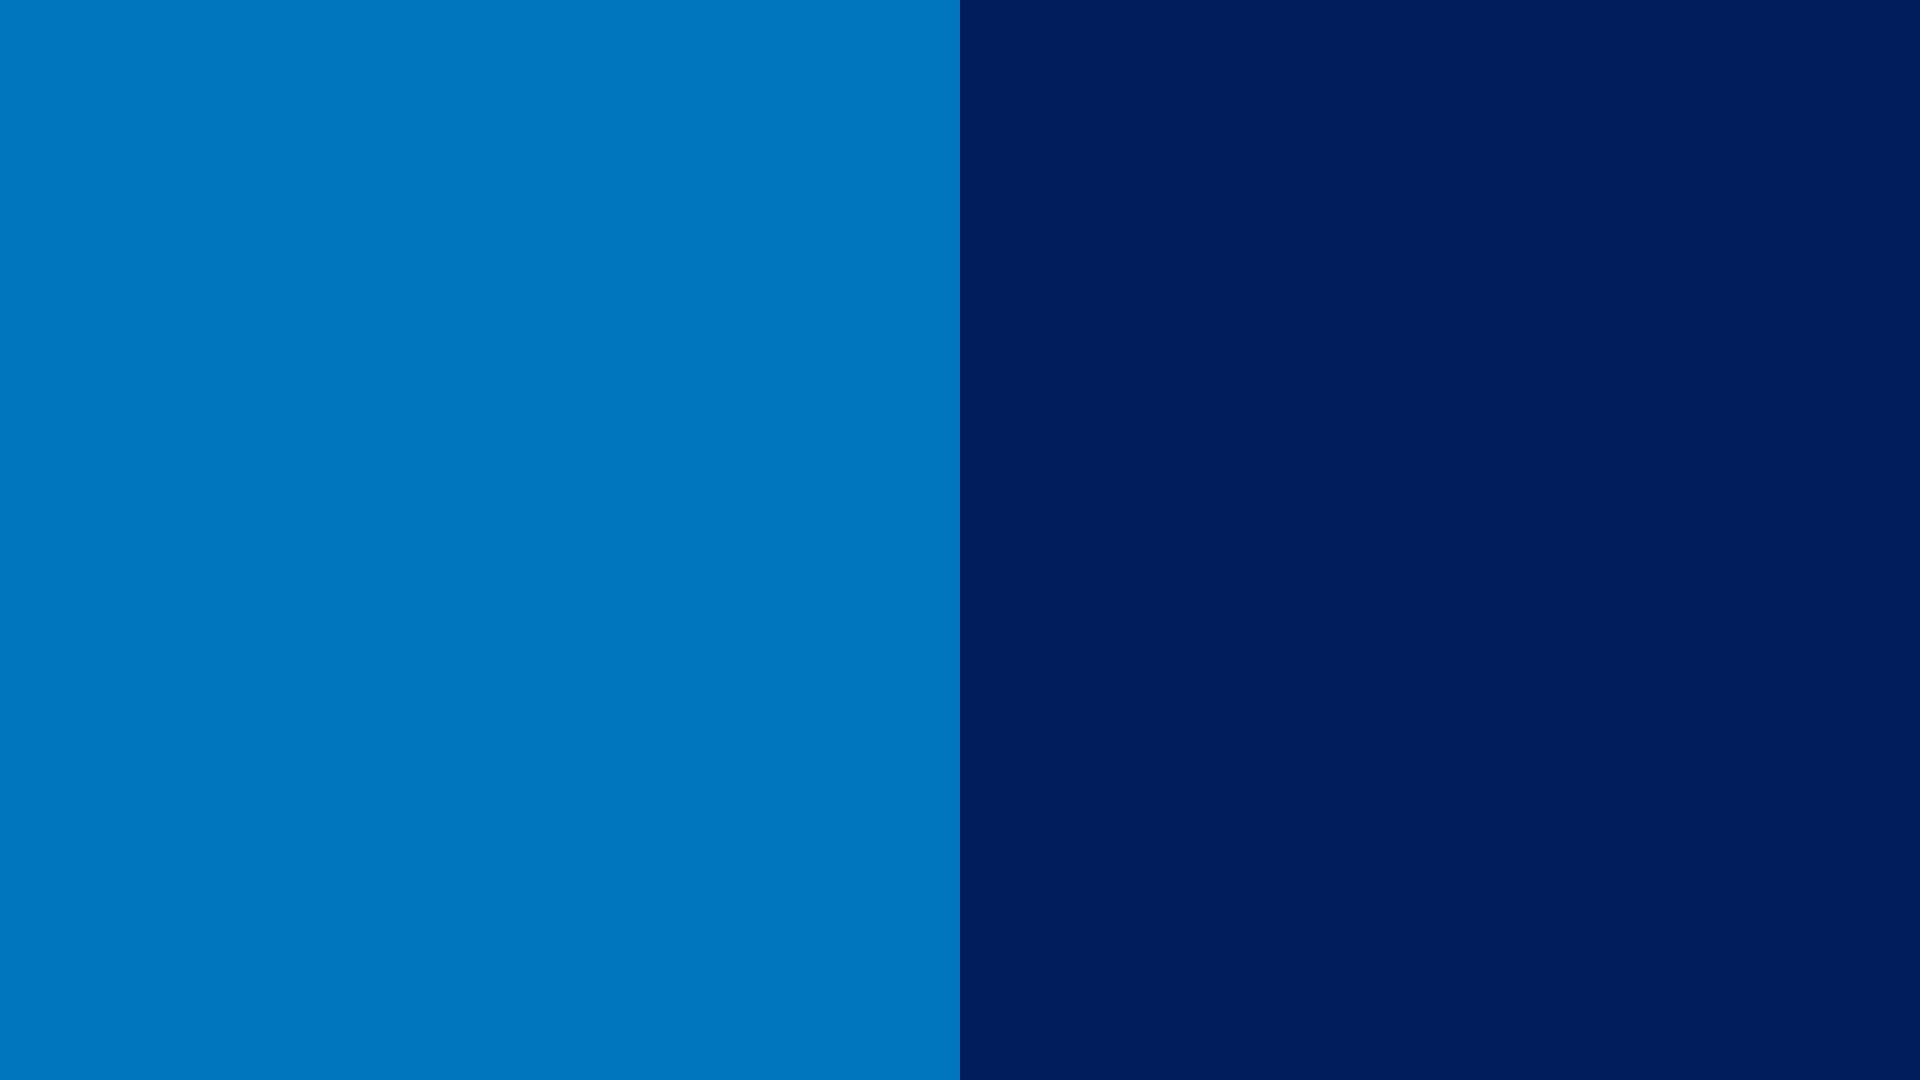 Constellation Brands Logo Color Scheme » Blue » SchemeColor.com.